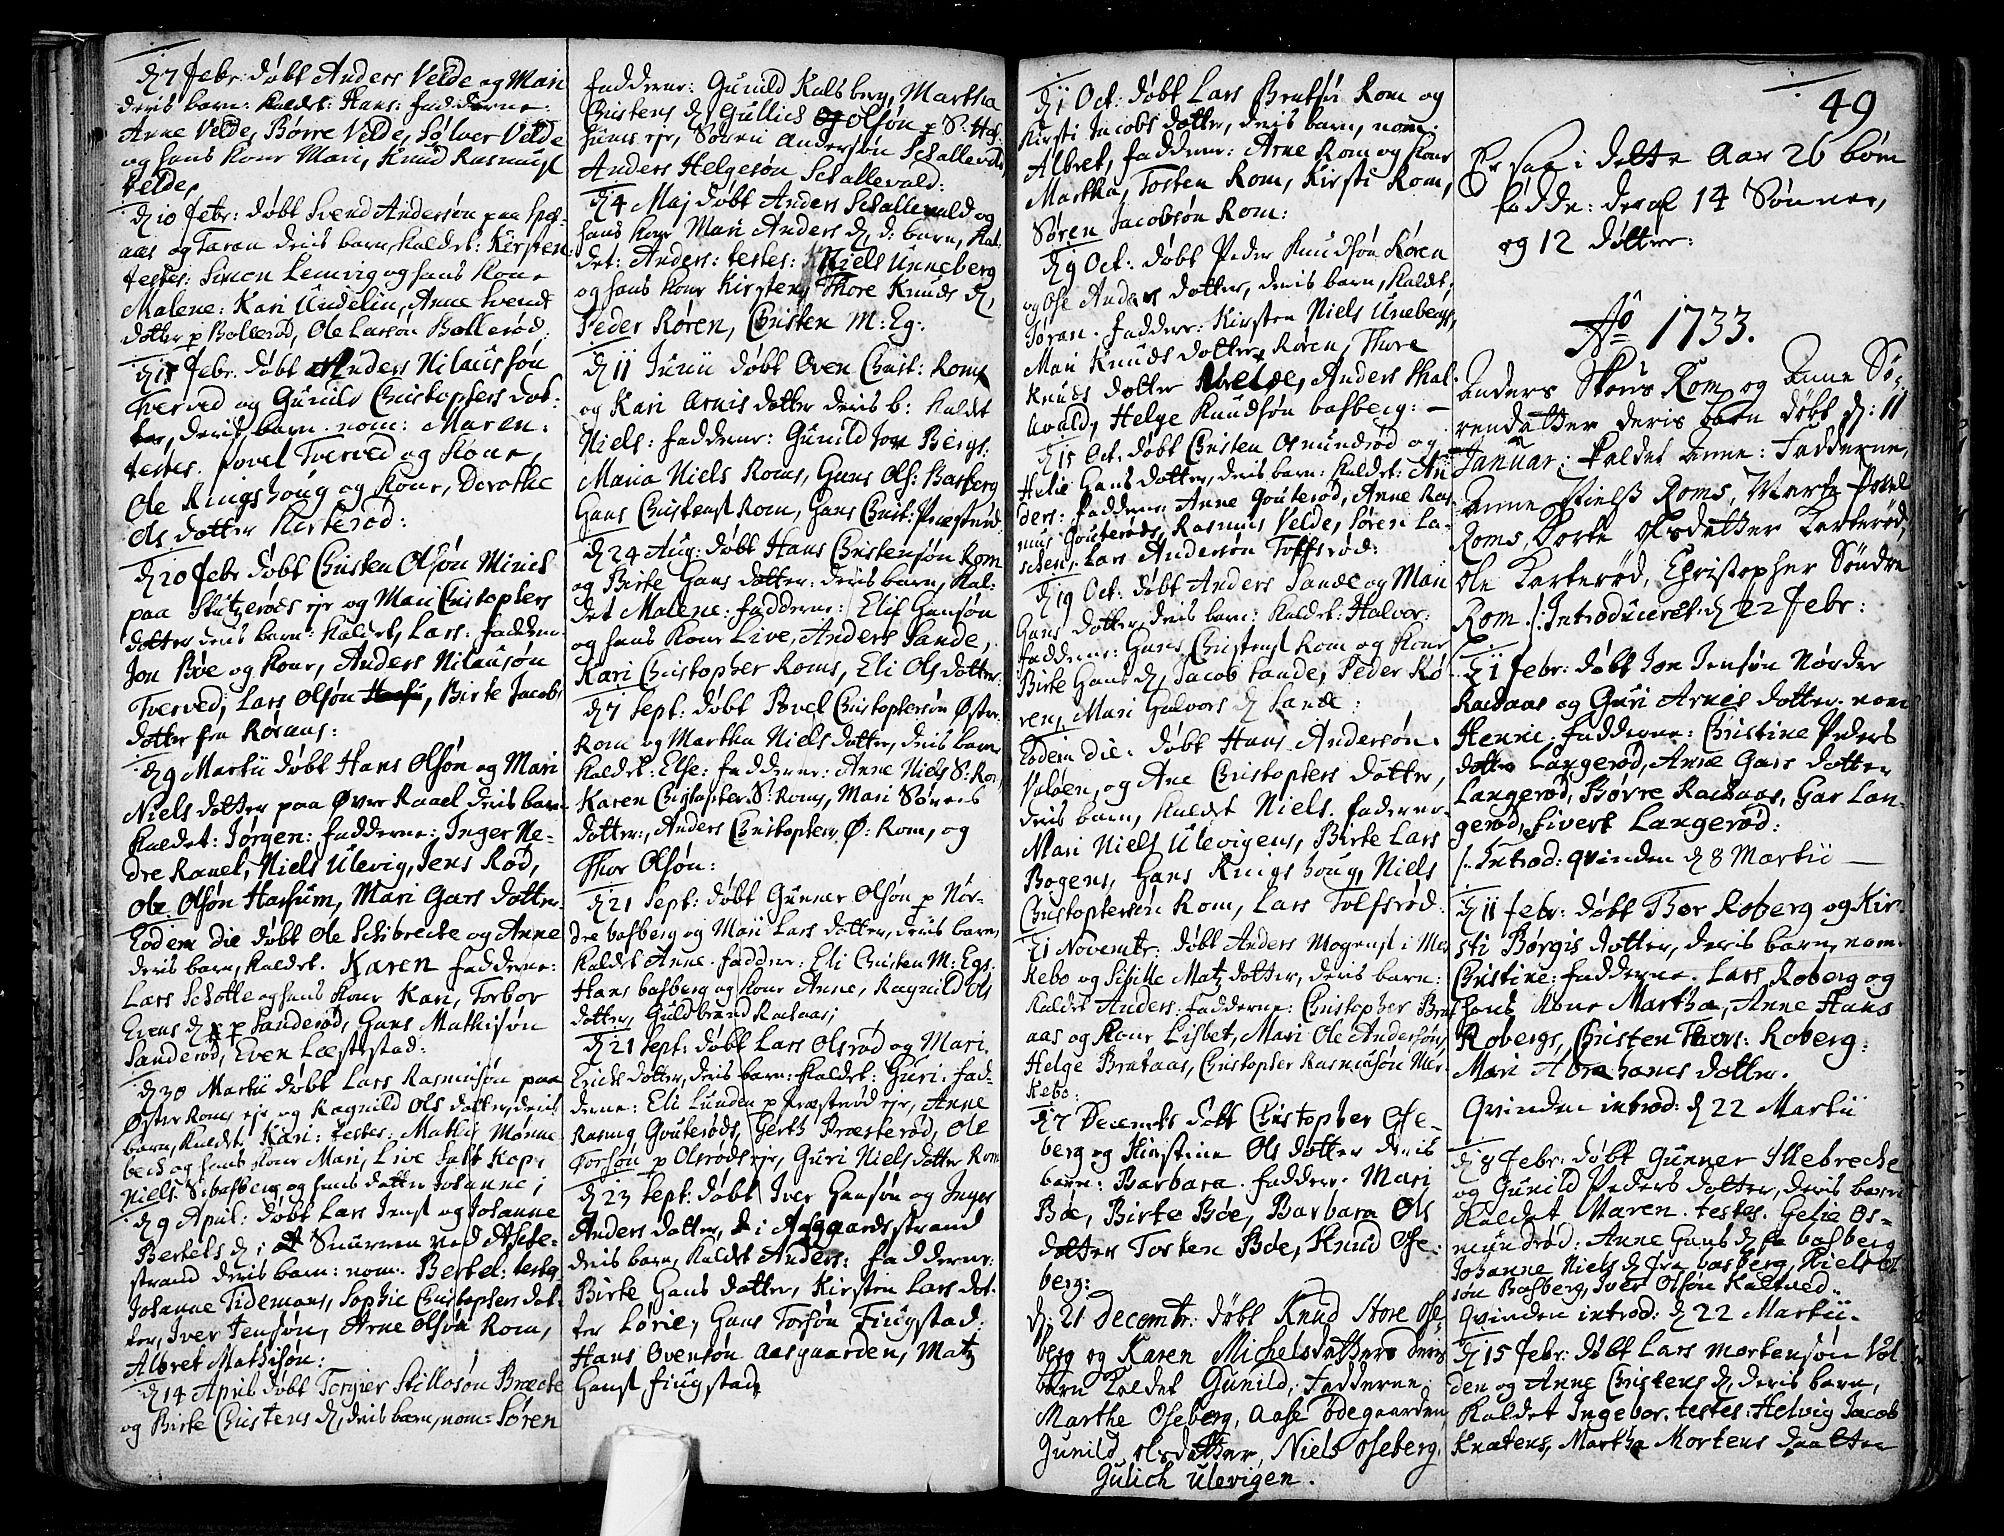 SAKO, Sem kirkebøker, F/Fb/L0001: Ministerialbok nr. II 1, 1702-1764, s. 49